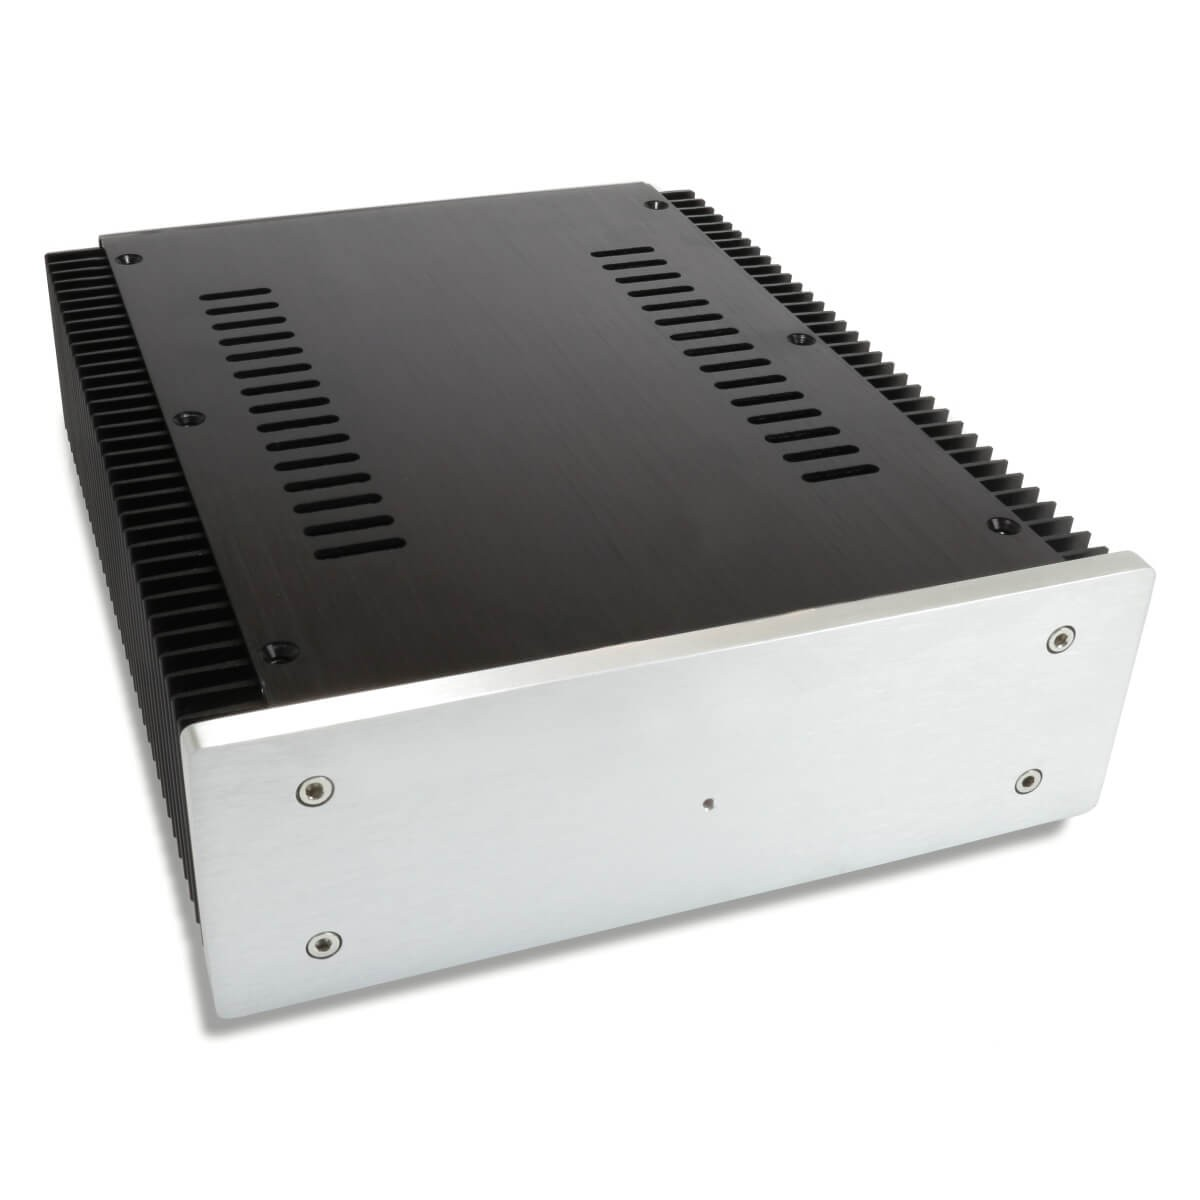 LPSU100 Stabilized Power supply 24V 4A 100W for FDA Amplifier